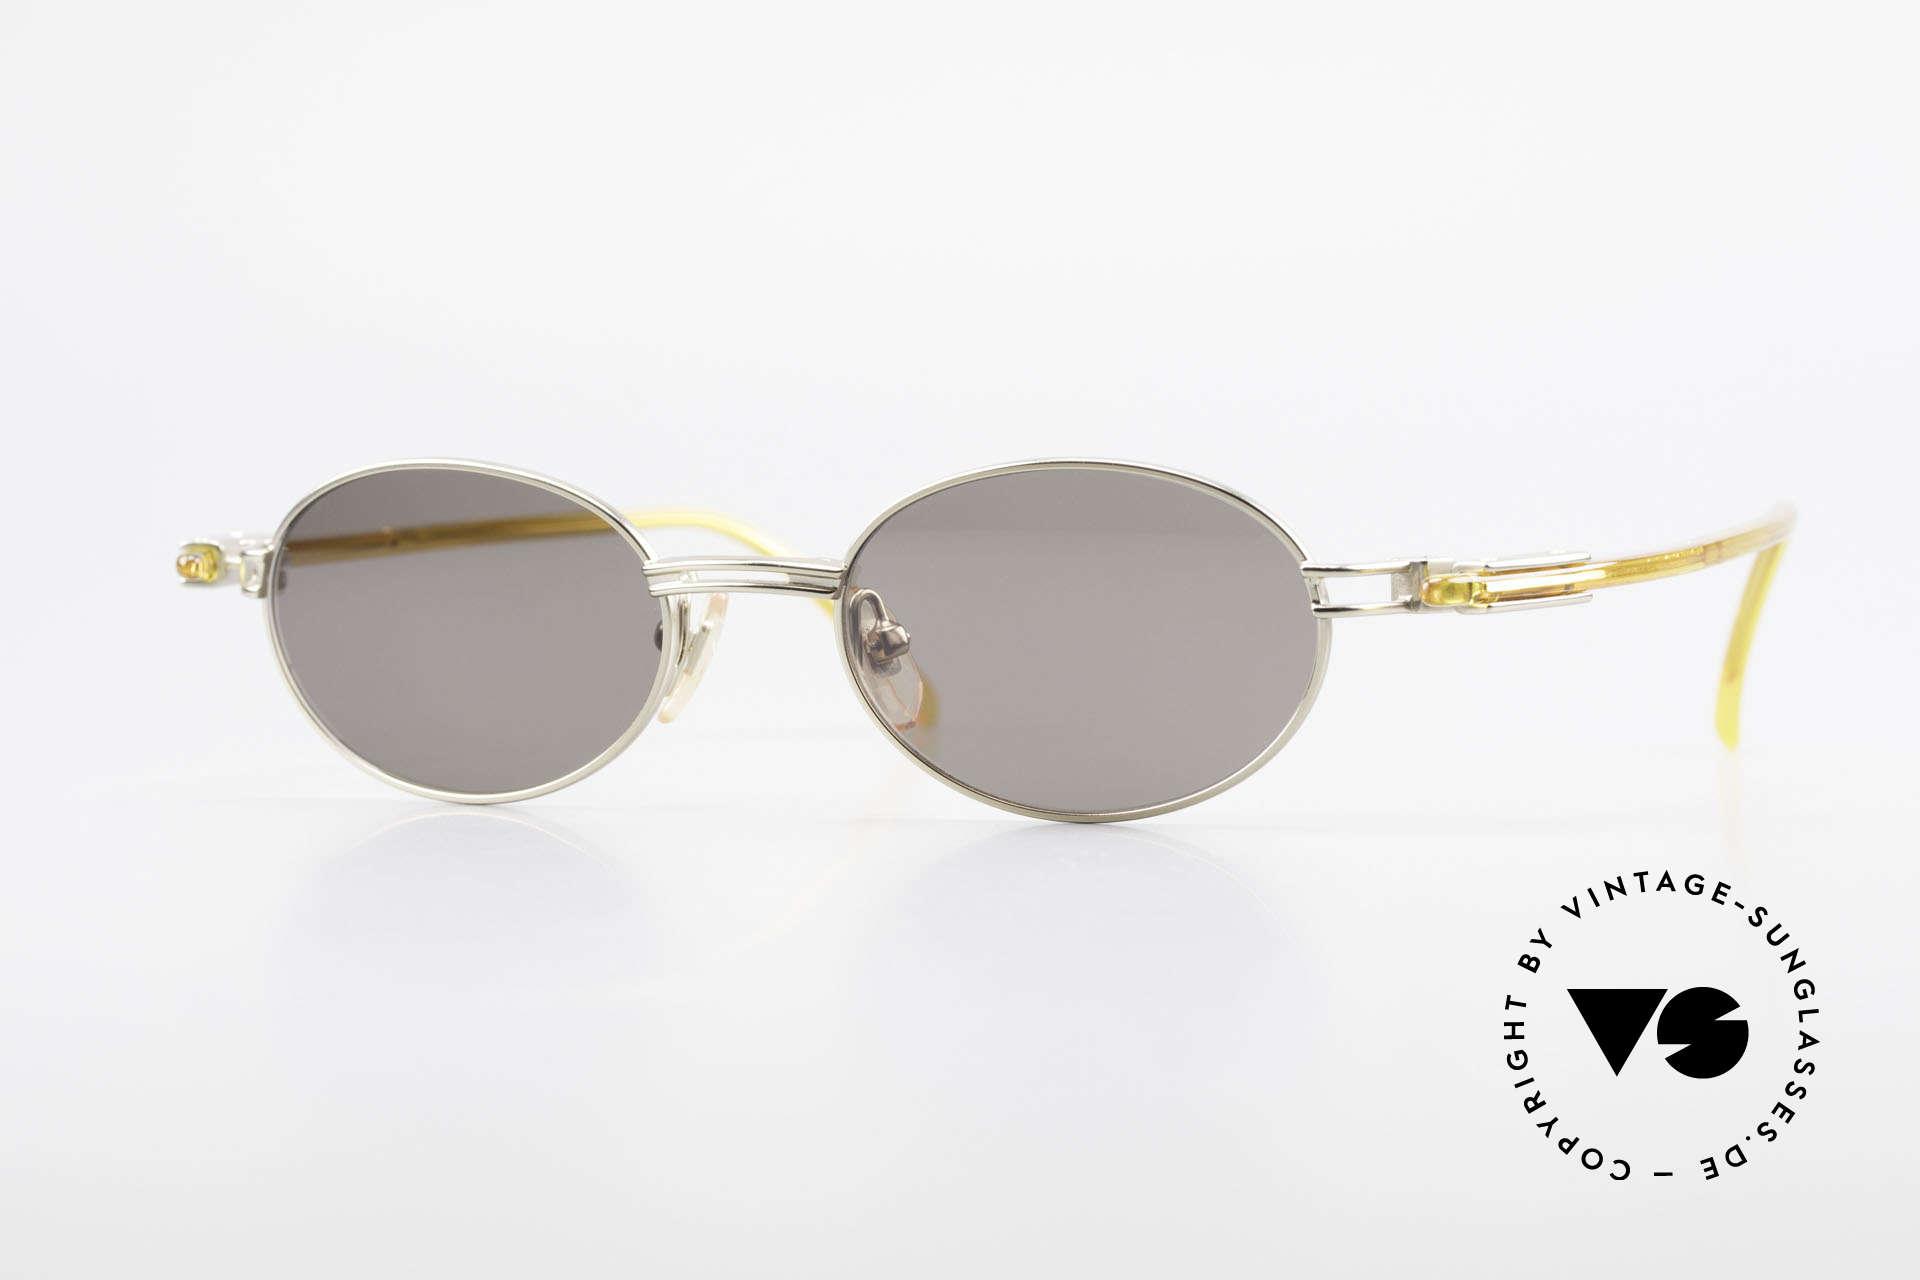 Yohji Yamamoto 52-7202 Designer Shades Oval Vintage, sporty oval 1990's Yohji YAMAMOTO vintage sunglasses, Made for Men and Women